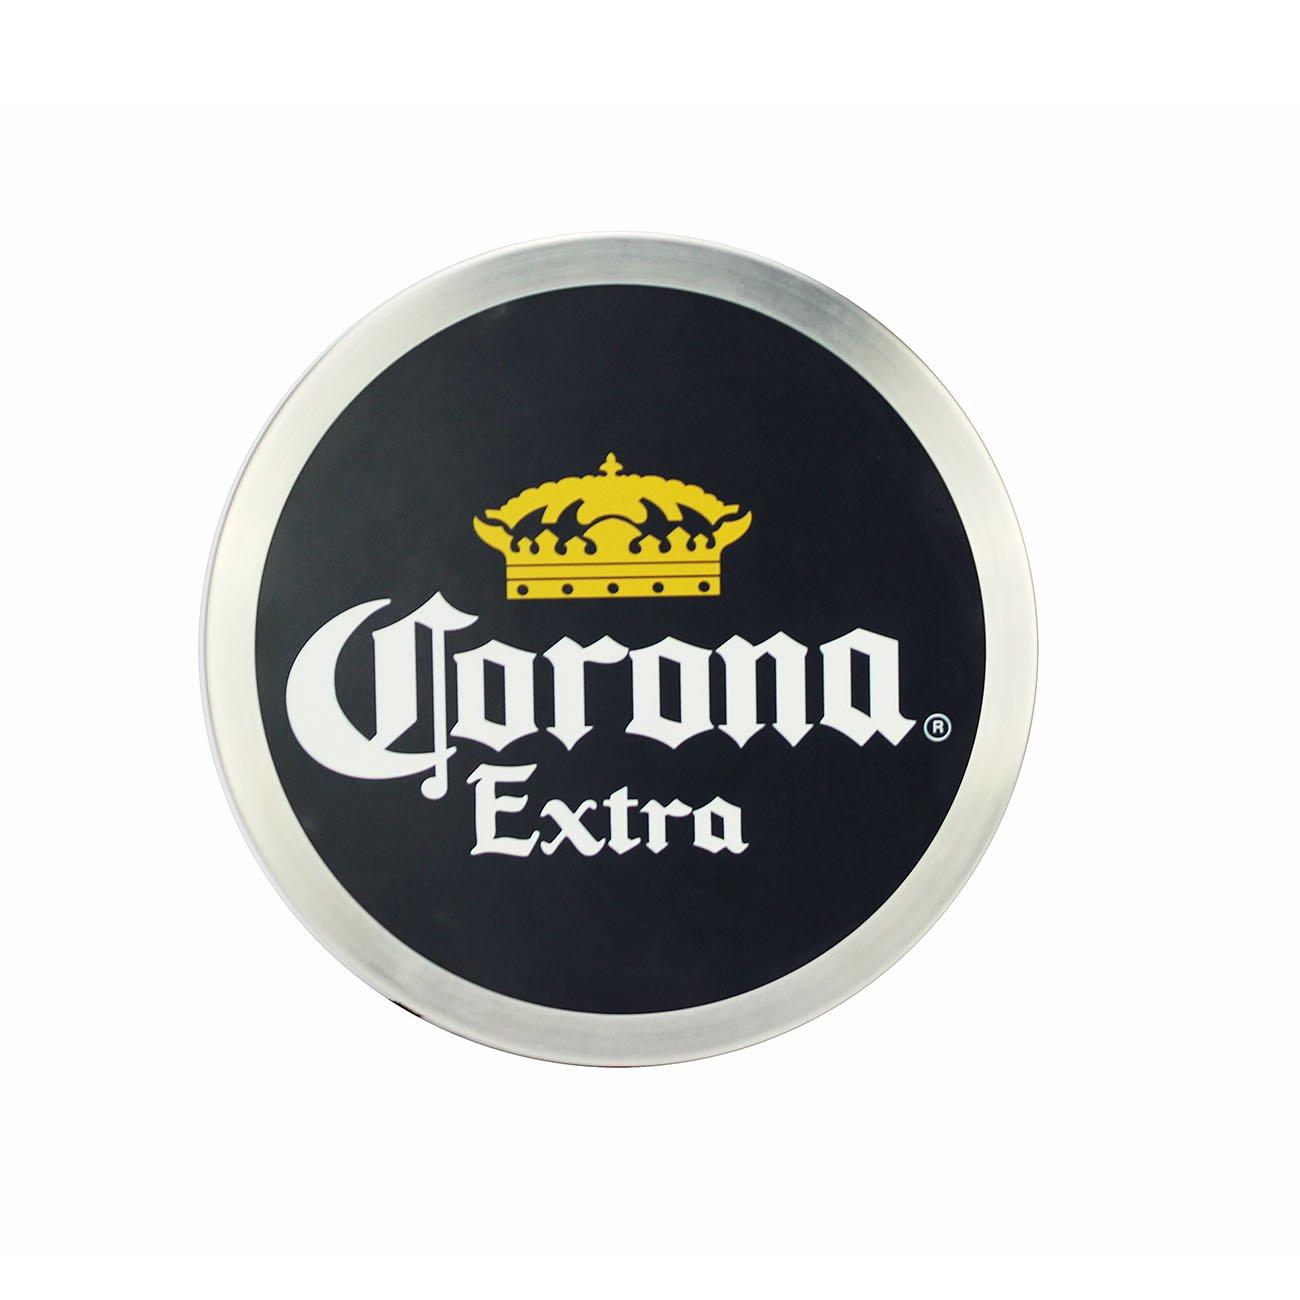 Luminoso Decorativo - Corona - 31 Cm - Bar Light